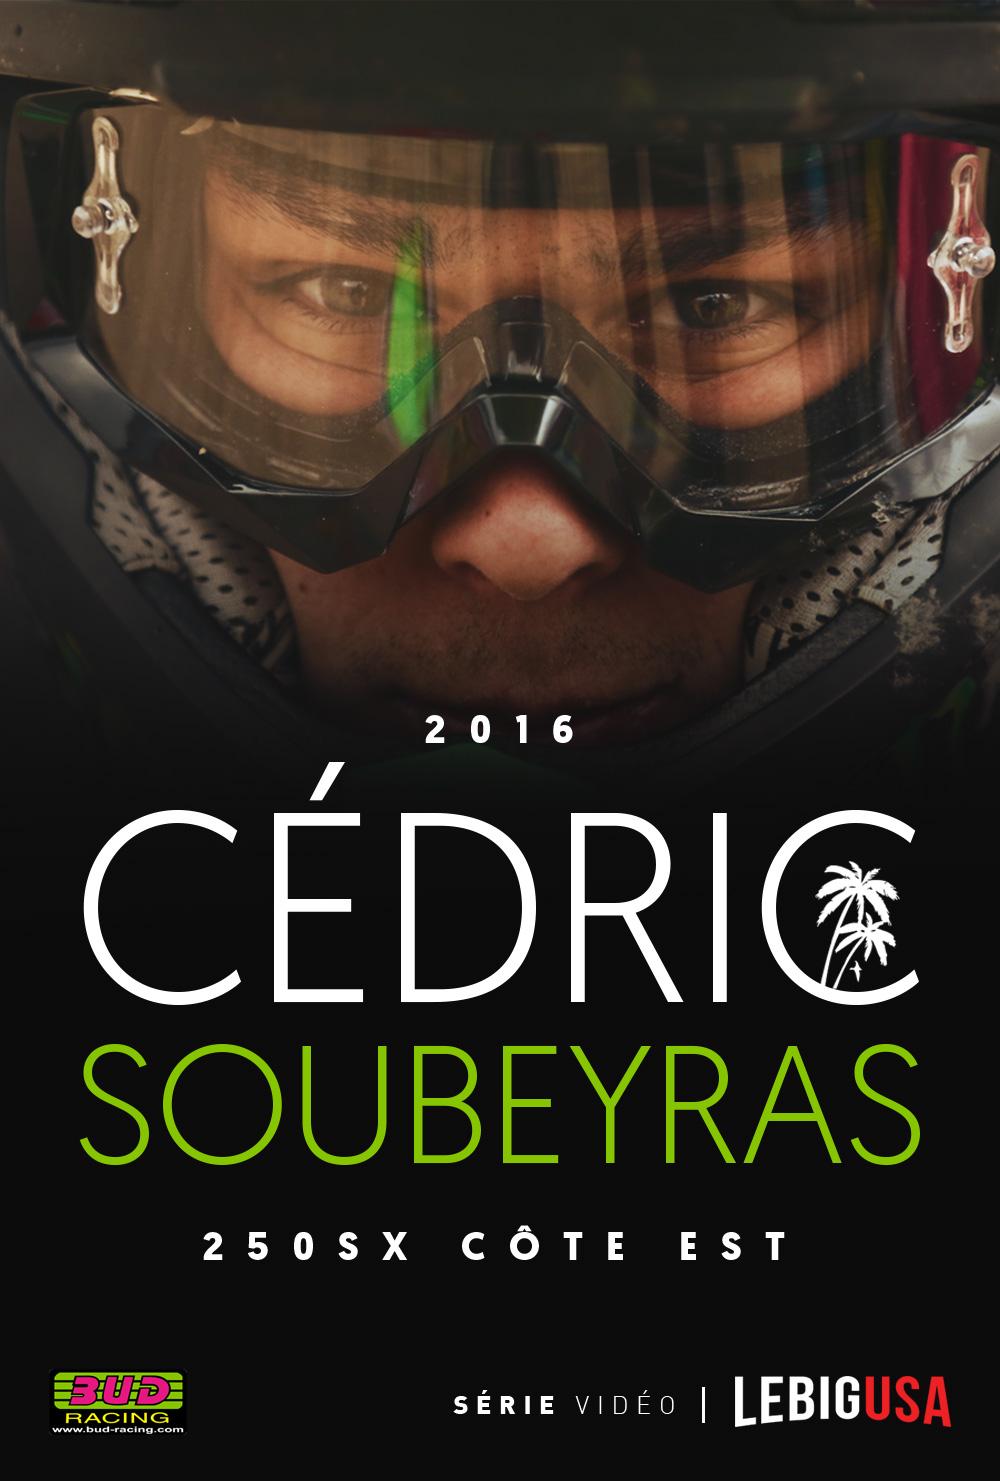 Cédric Soubeyras en SX 250